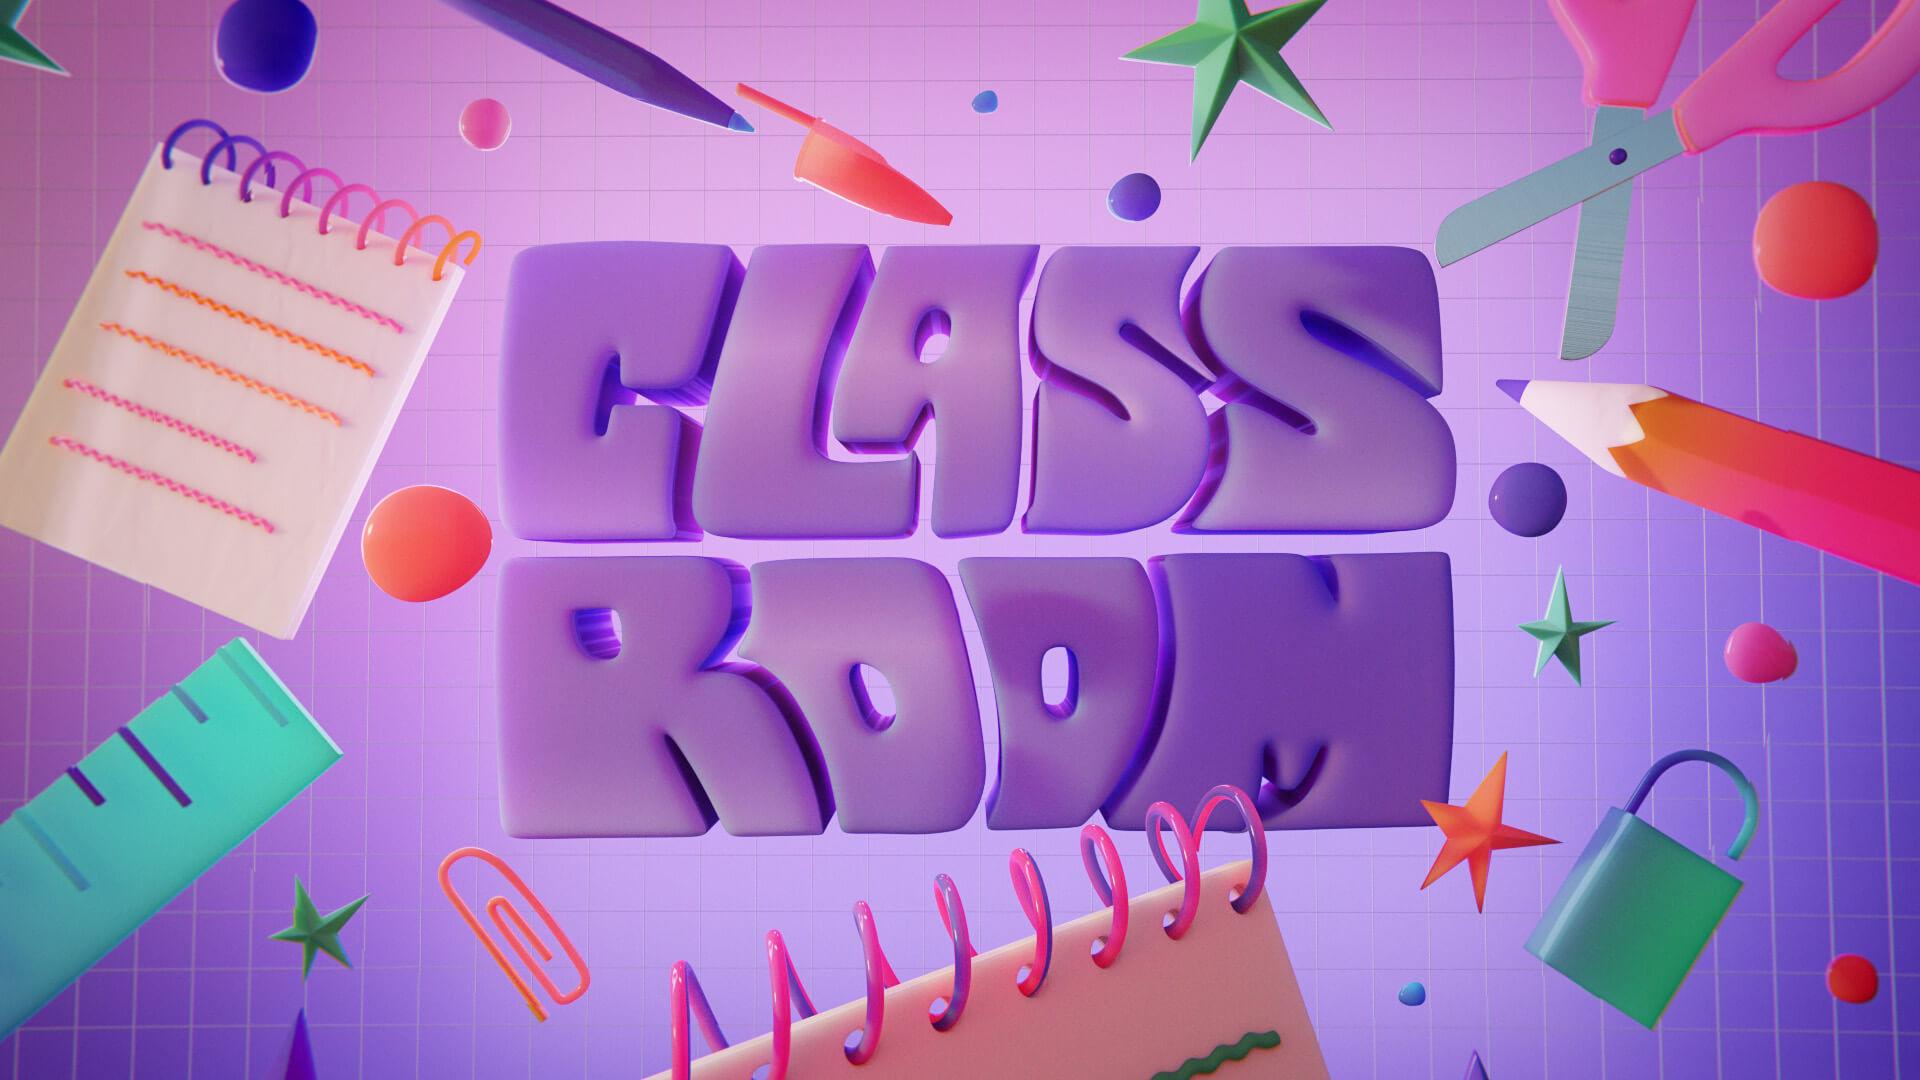 roofstudio_juni-learning_classroom-02-5